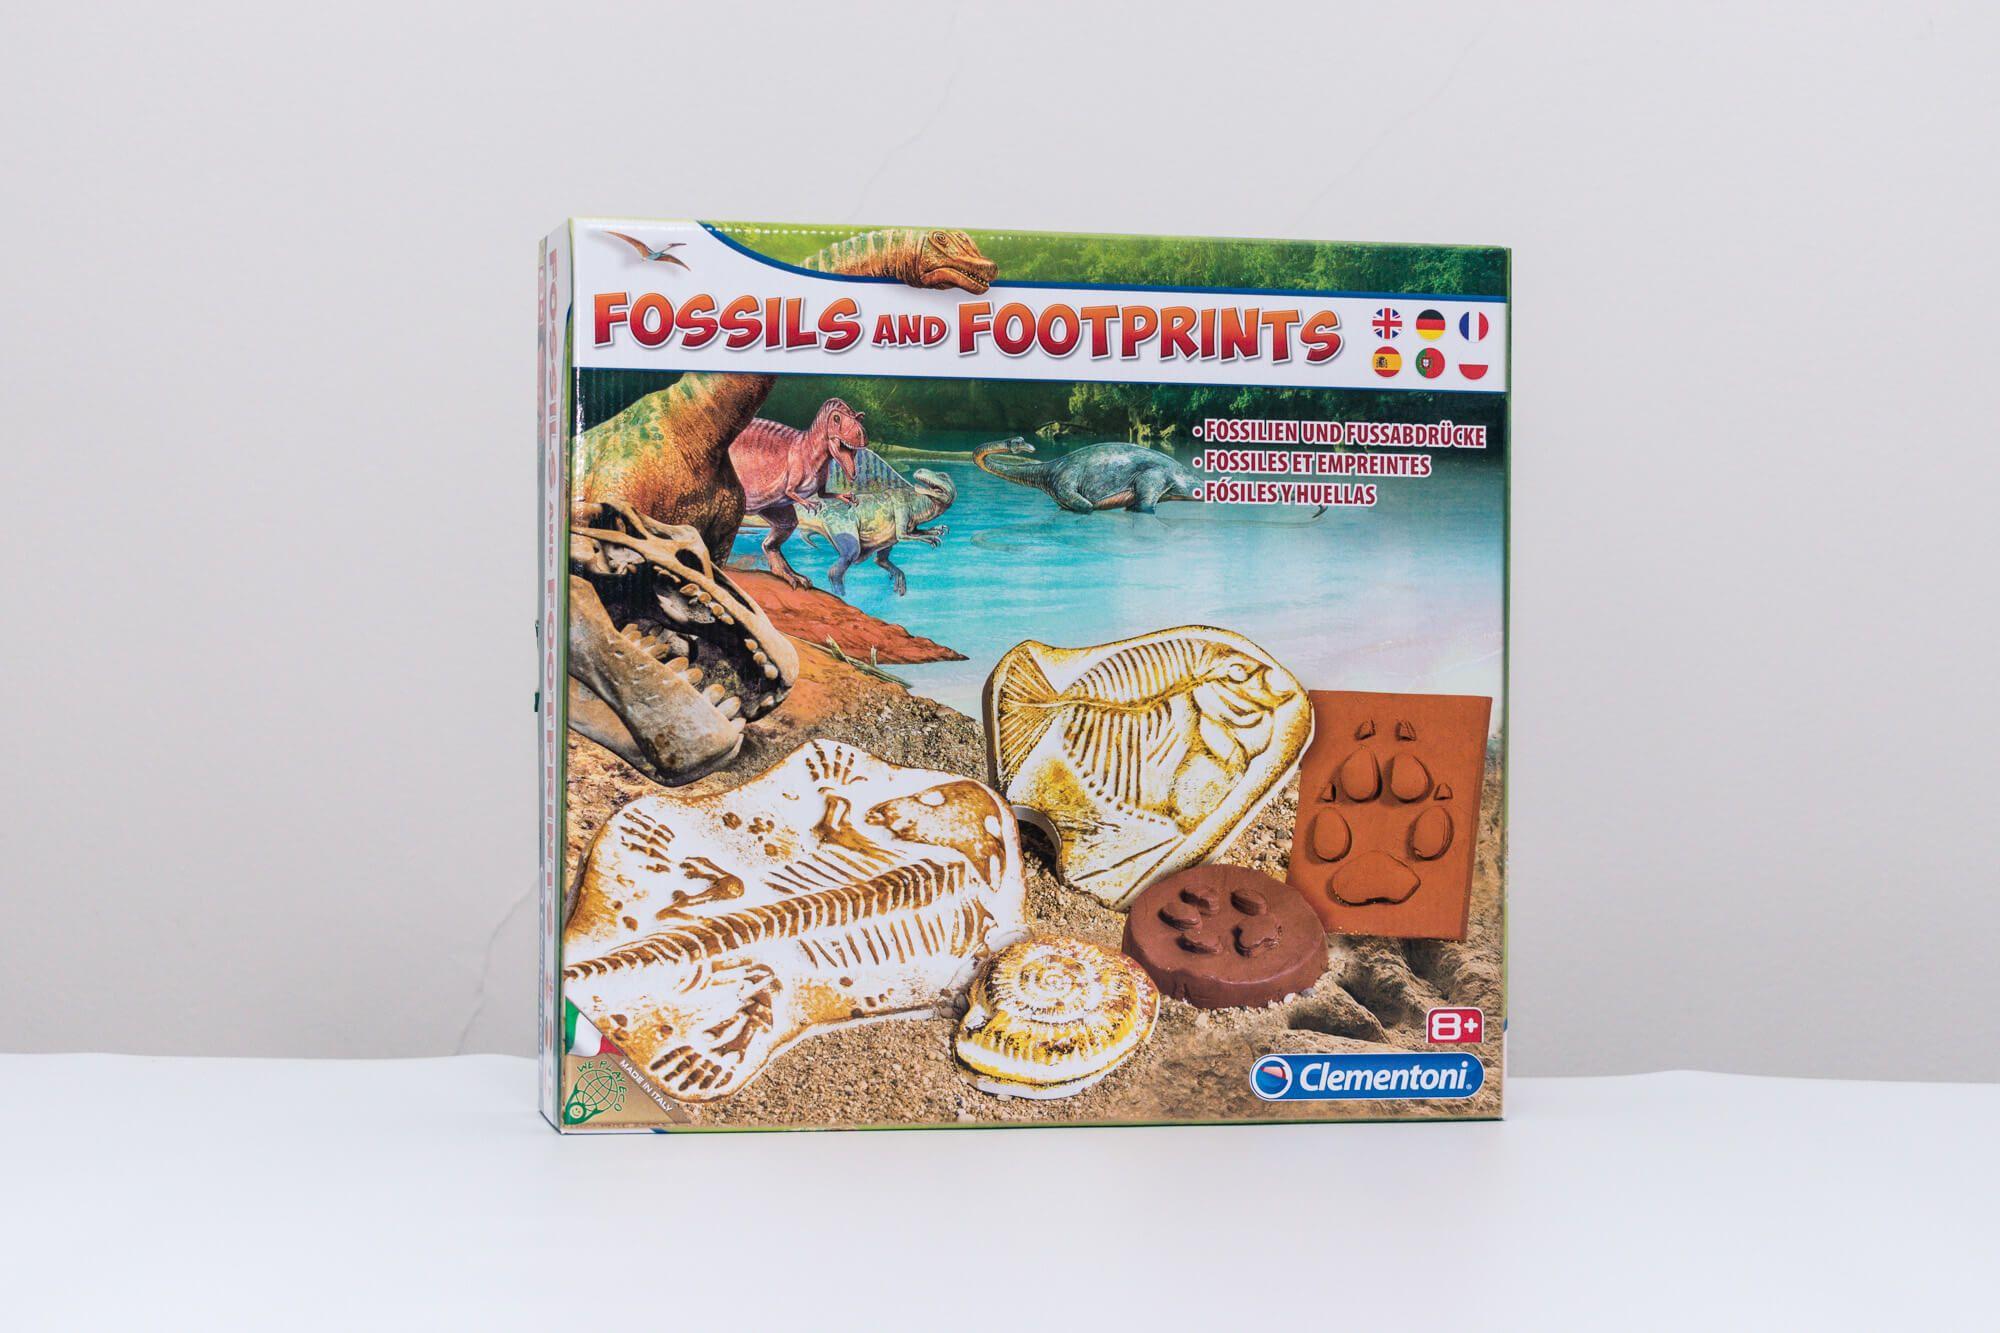 Clementoni Fosil i otisci stopala